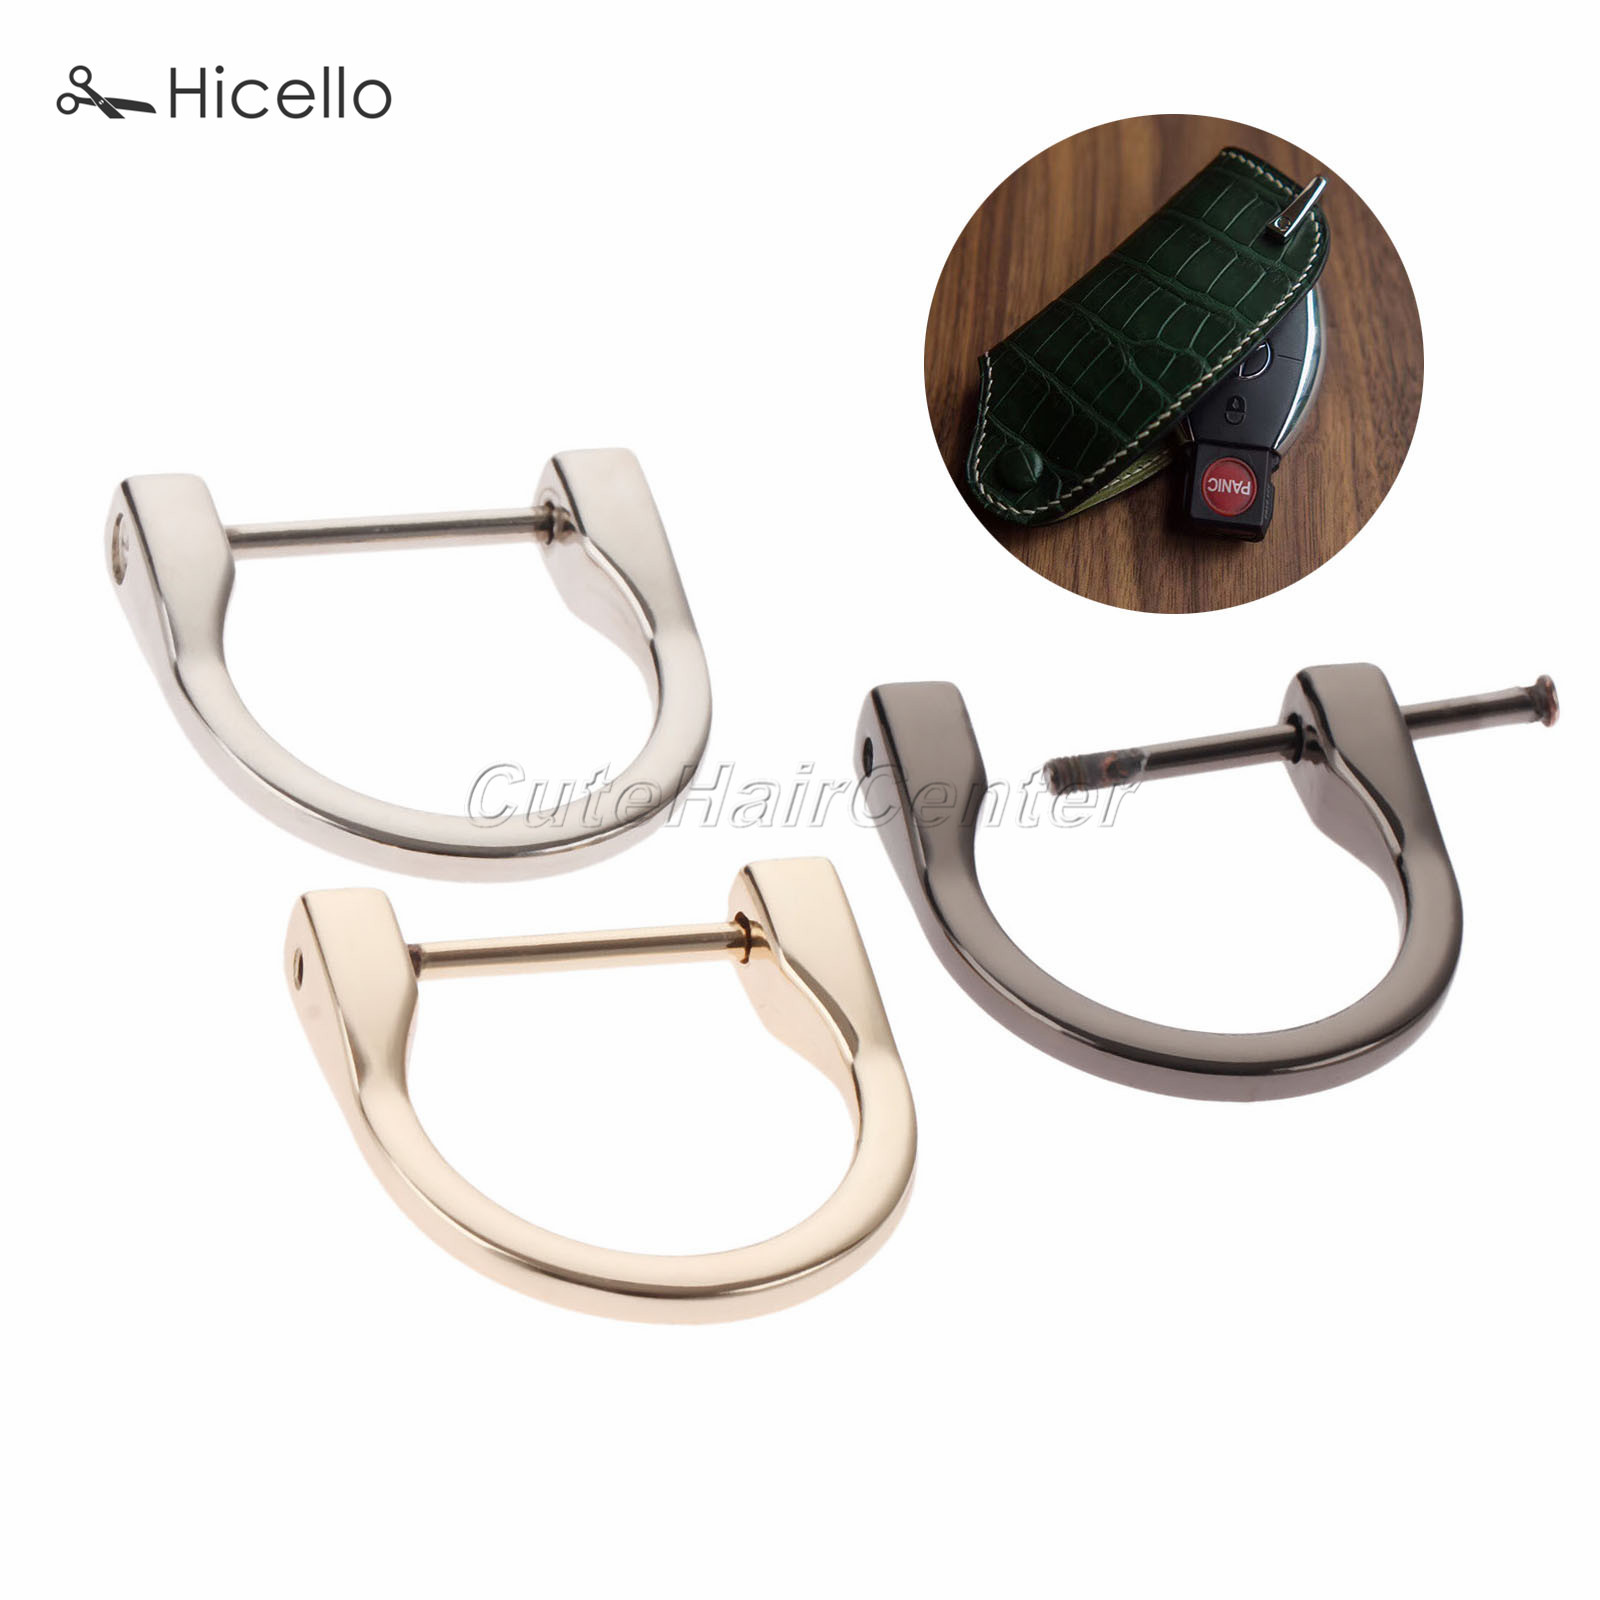 2Pcs Metal D Rings Buckles for belt buckle